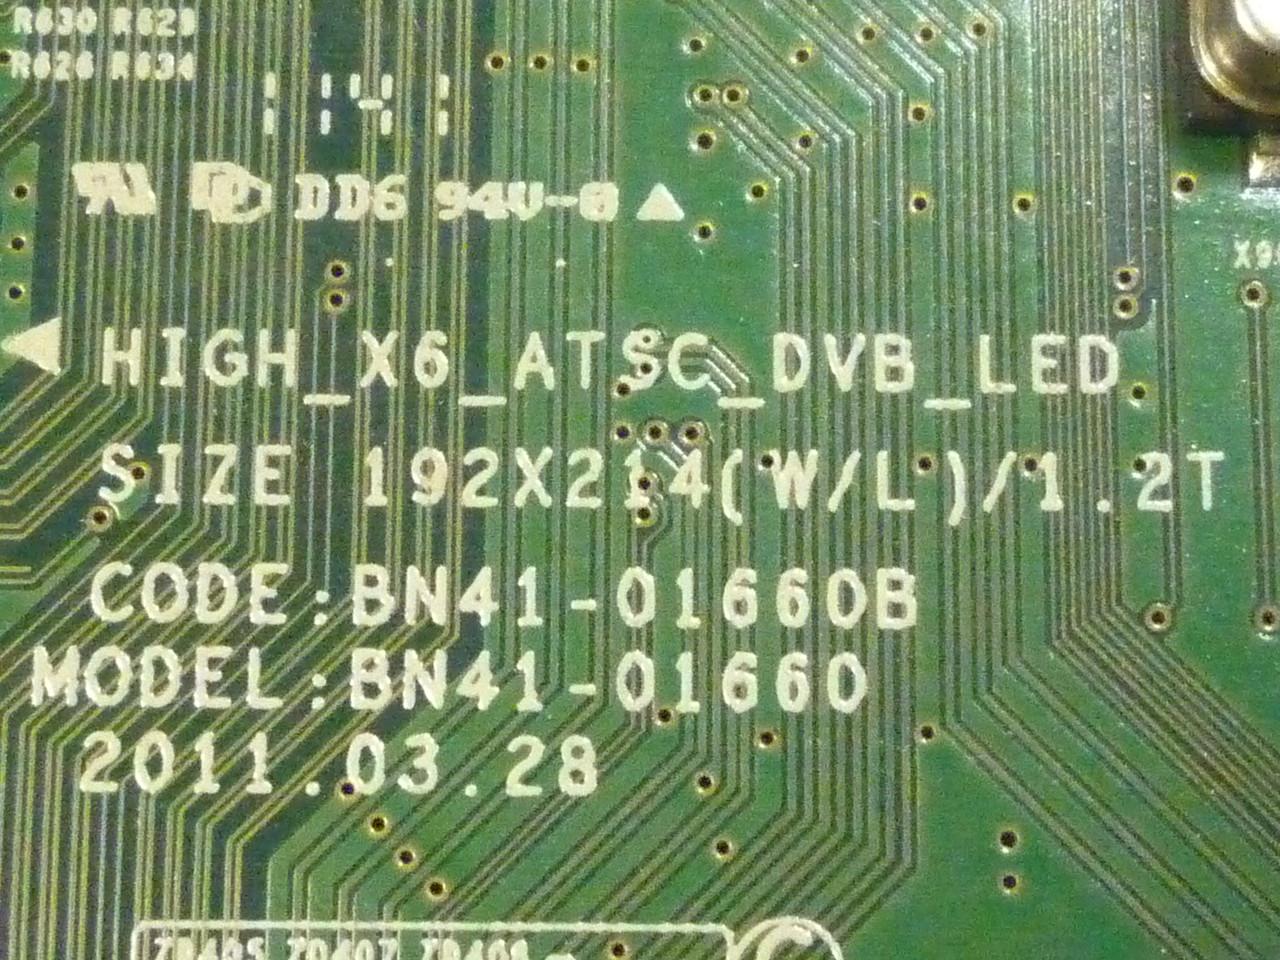 Main-Board (материнская плата) BN41-01660B для телевизоров Samsung UExxD55xx.